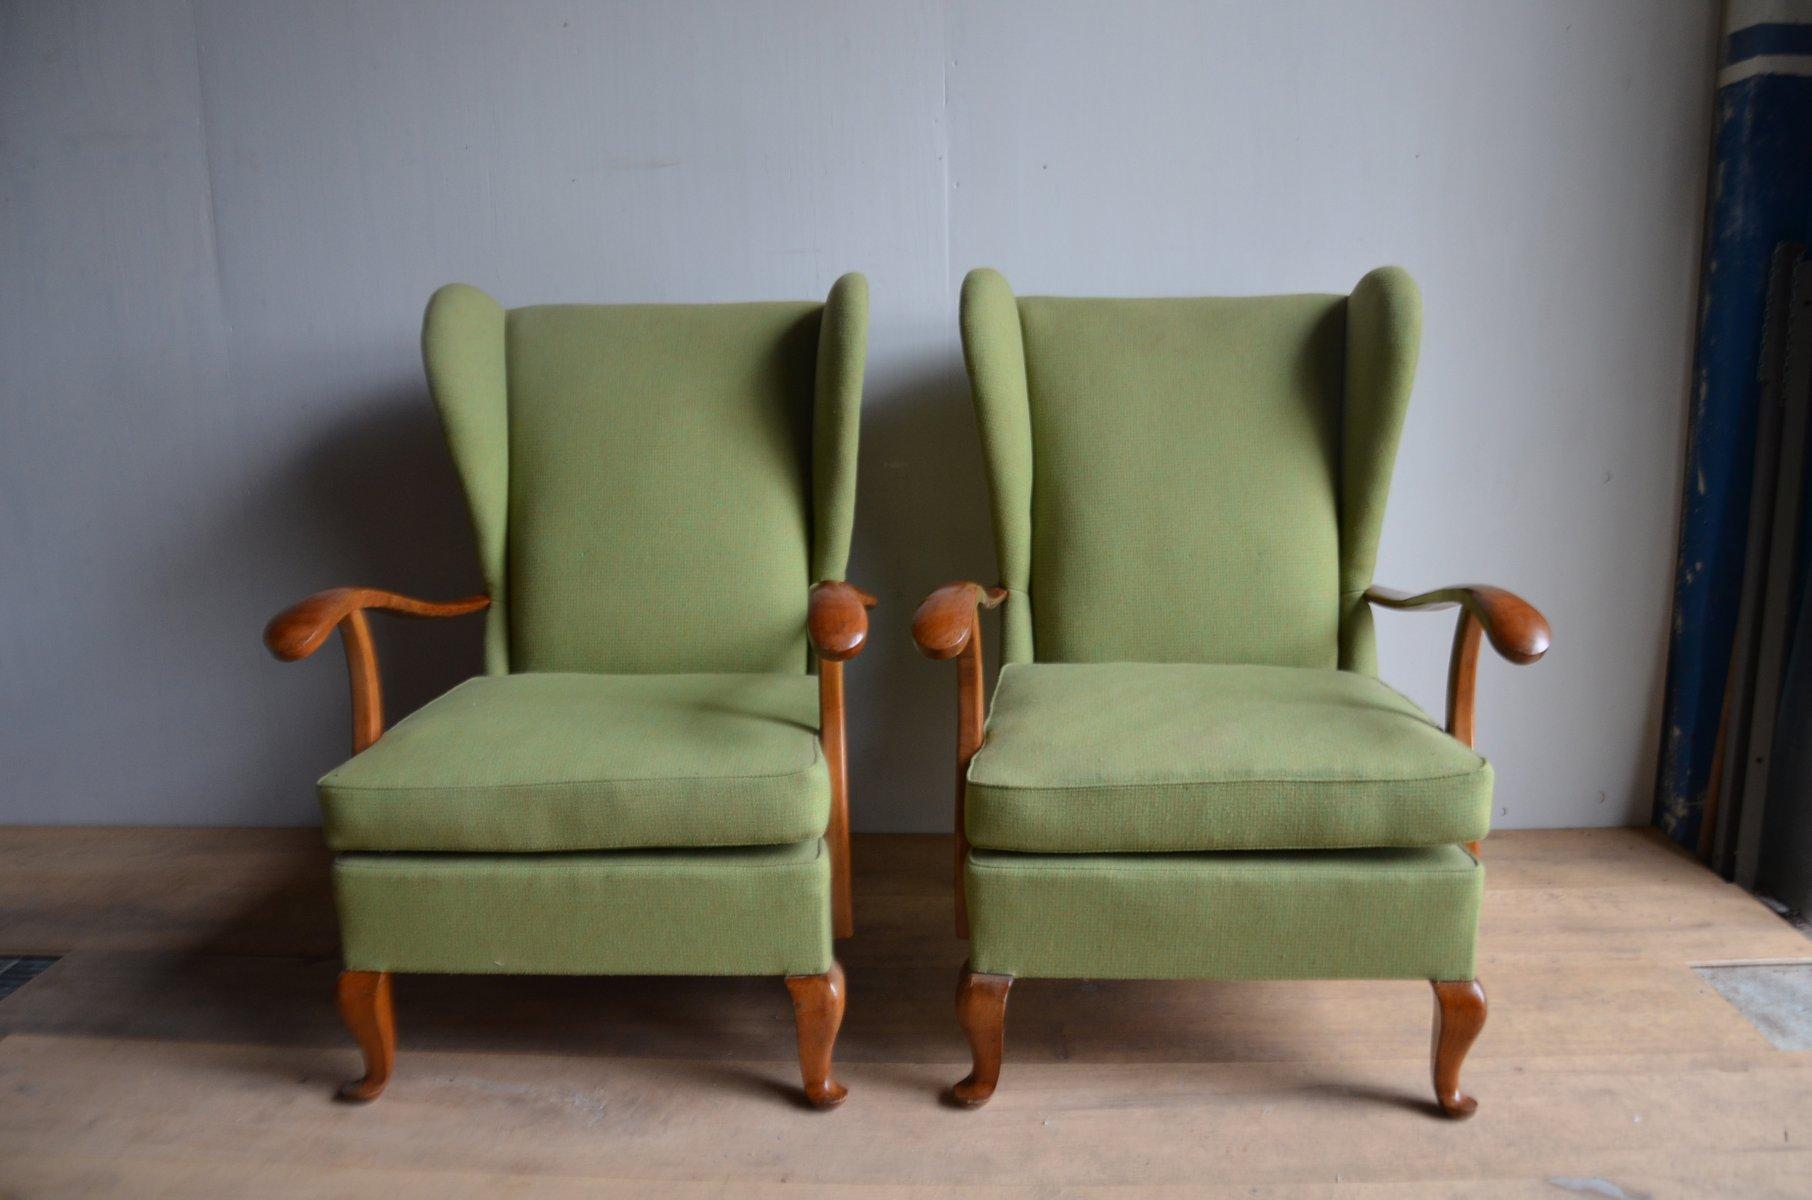 italienische mid century sessel von paolo buffa 1964 2er set bei pamono kaufen. Black Bedroom Furniture Sets. Home Design Ideas